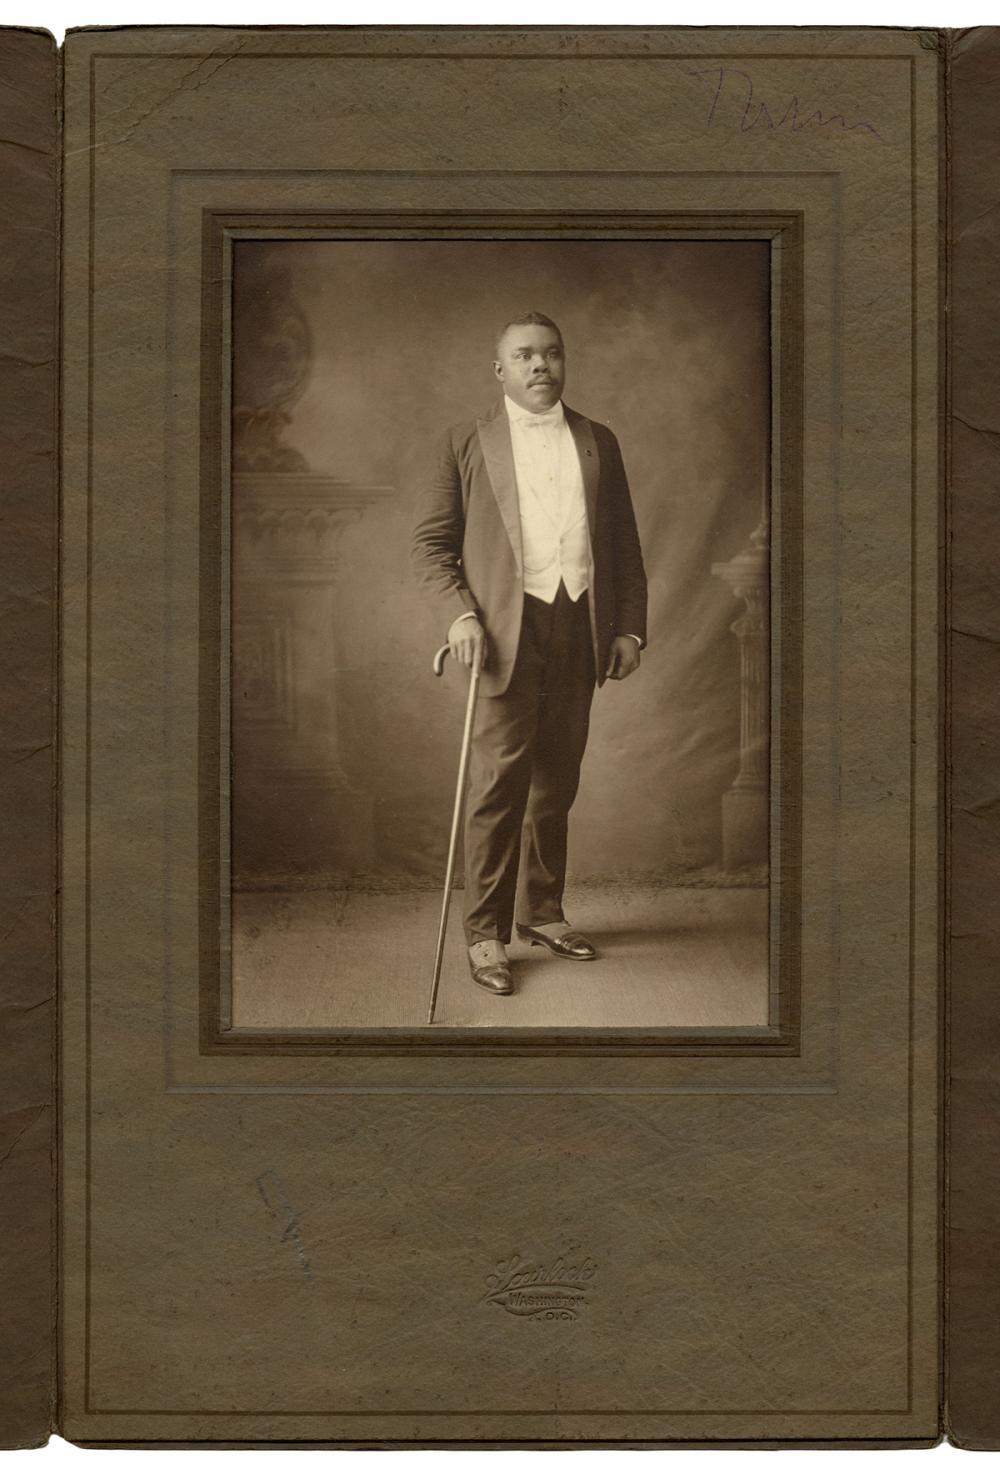 GARVEY, MARCUS (1887-1940). SCURLOCK STUDIO PORTRAIT OF MAR...